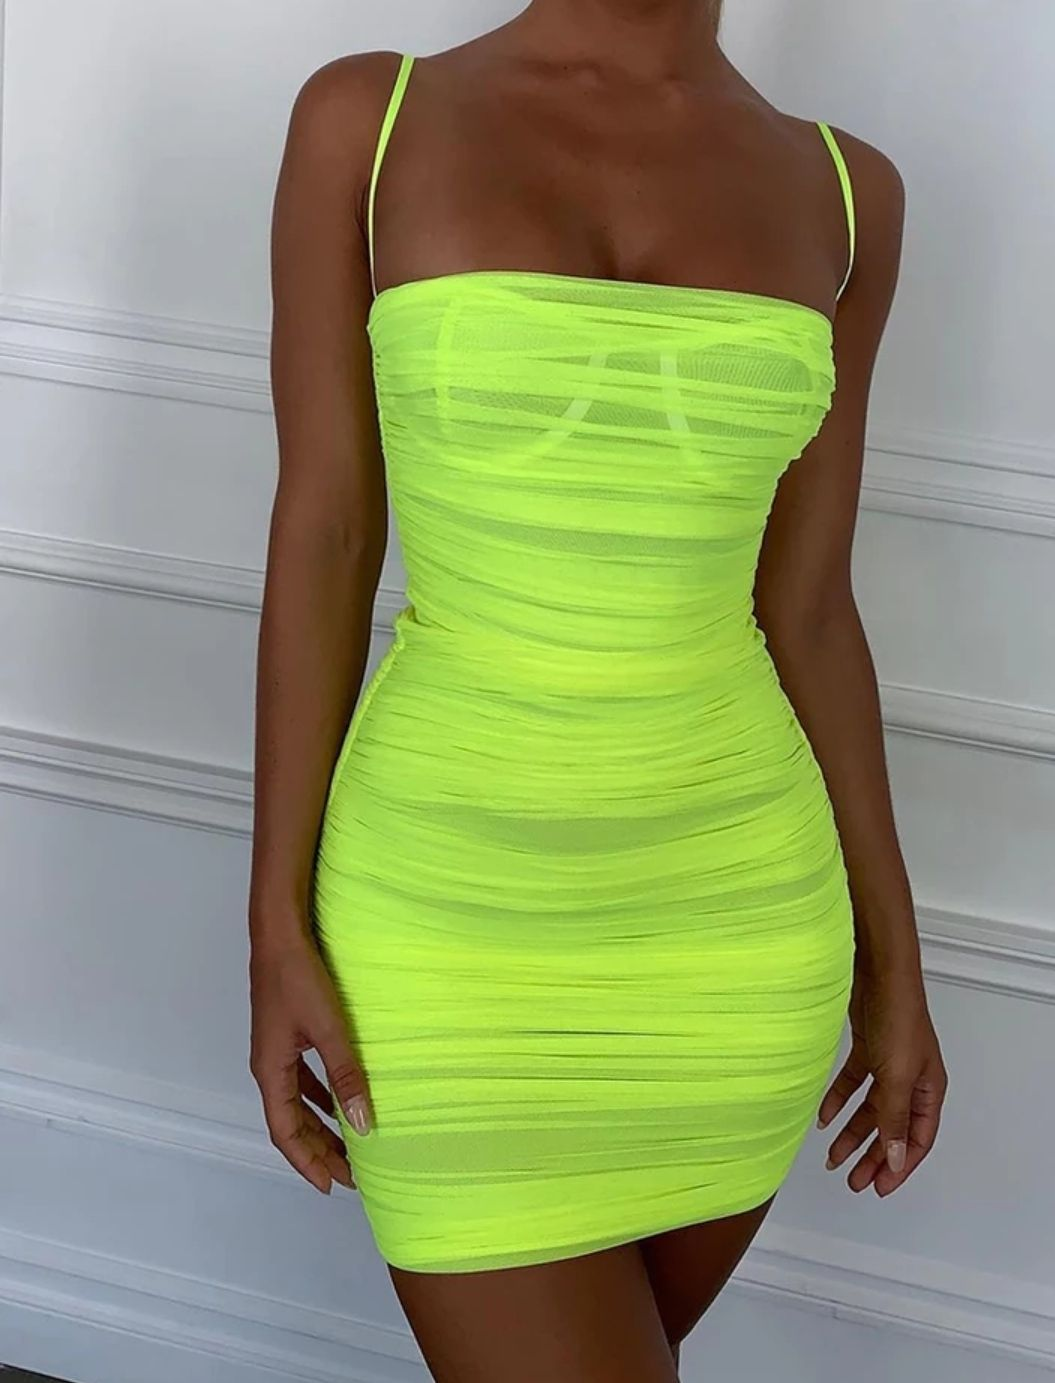 Mesh Lime Bodycon Dress Women Bodycon Dress Neon Green Dresses Neon Dresses